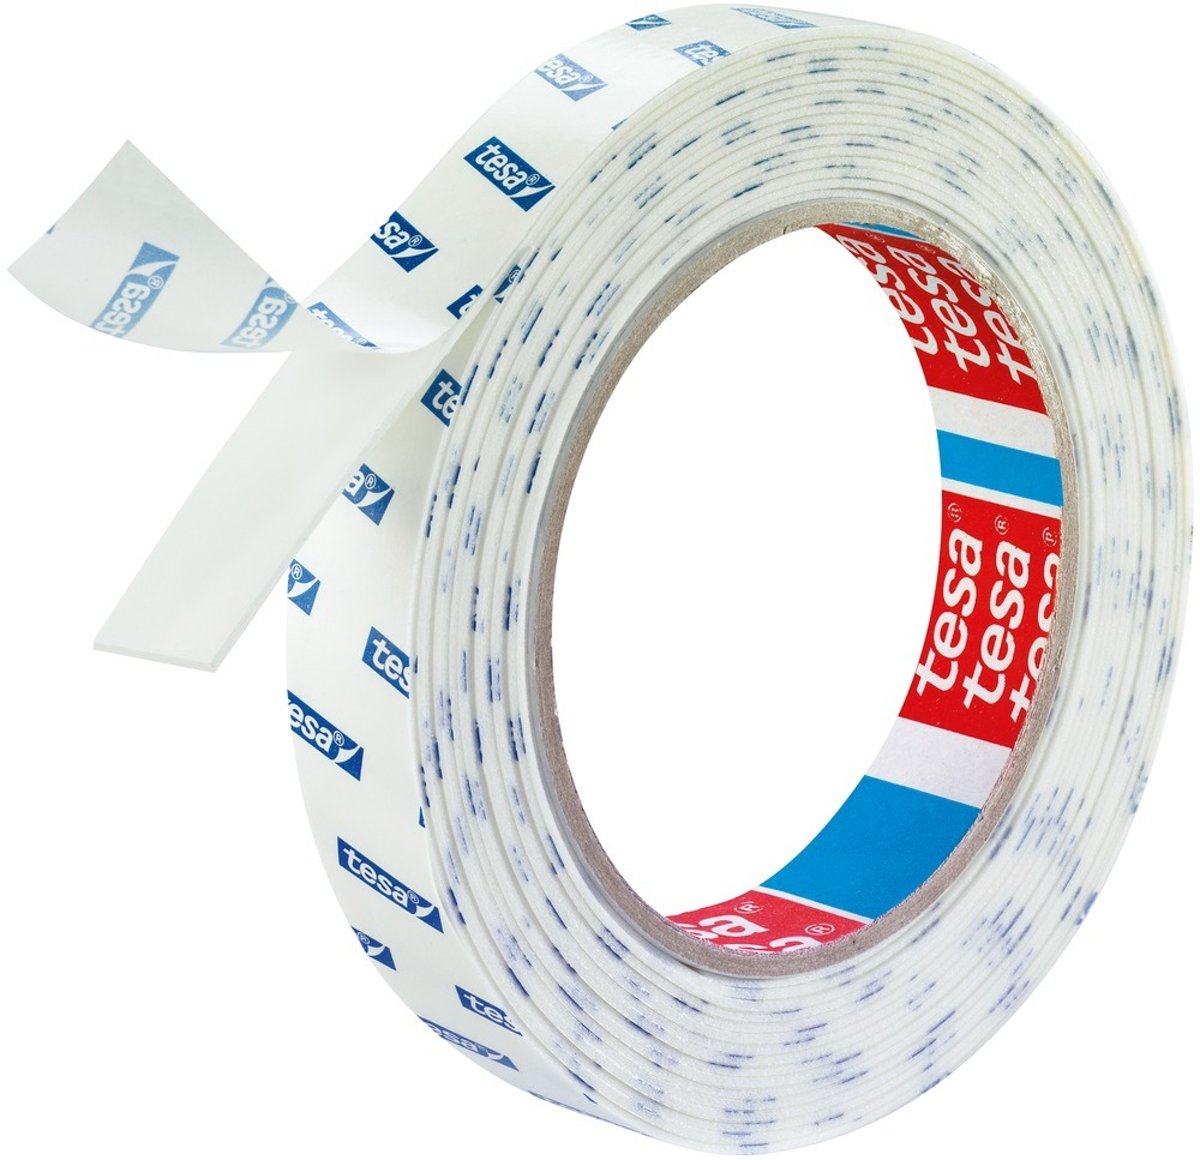 Tesa 77745 Powerbond montageband waterproof 5 m x 19 mm